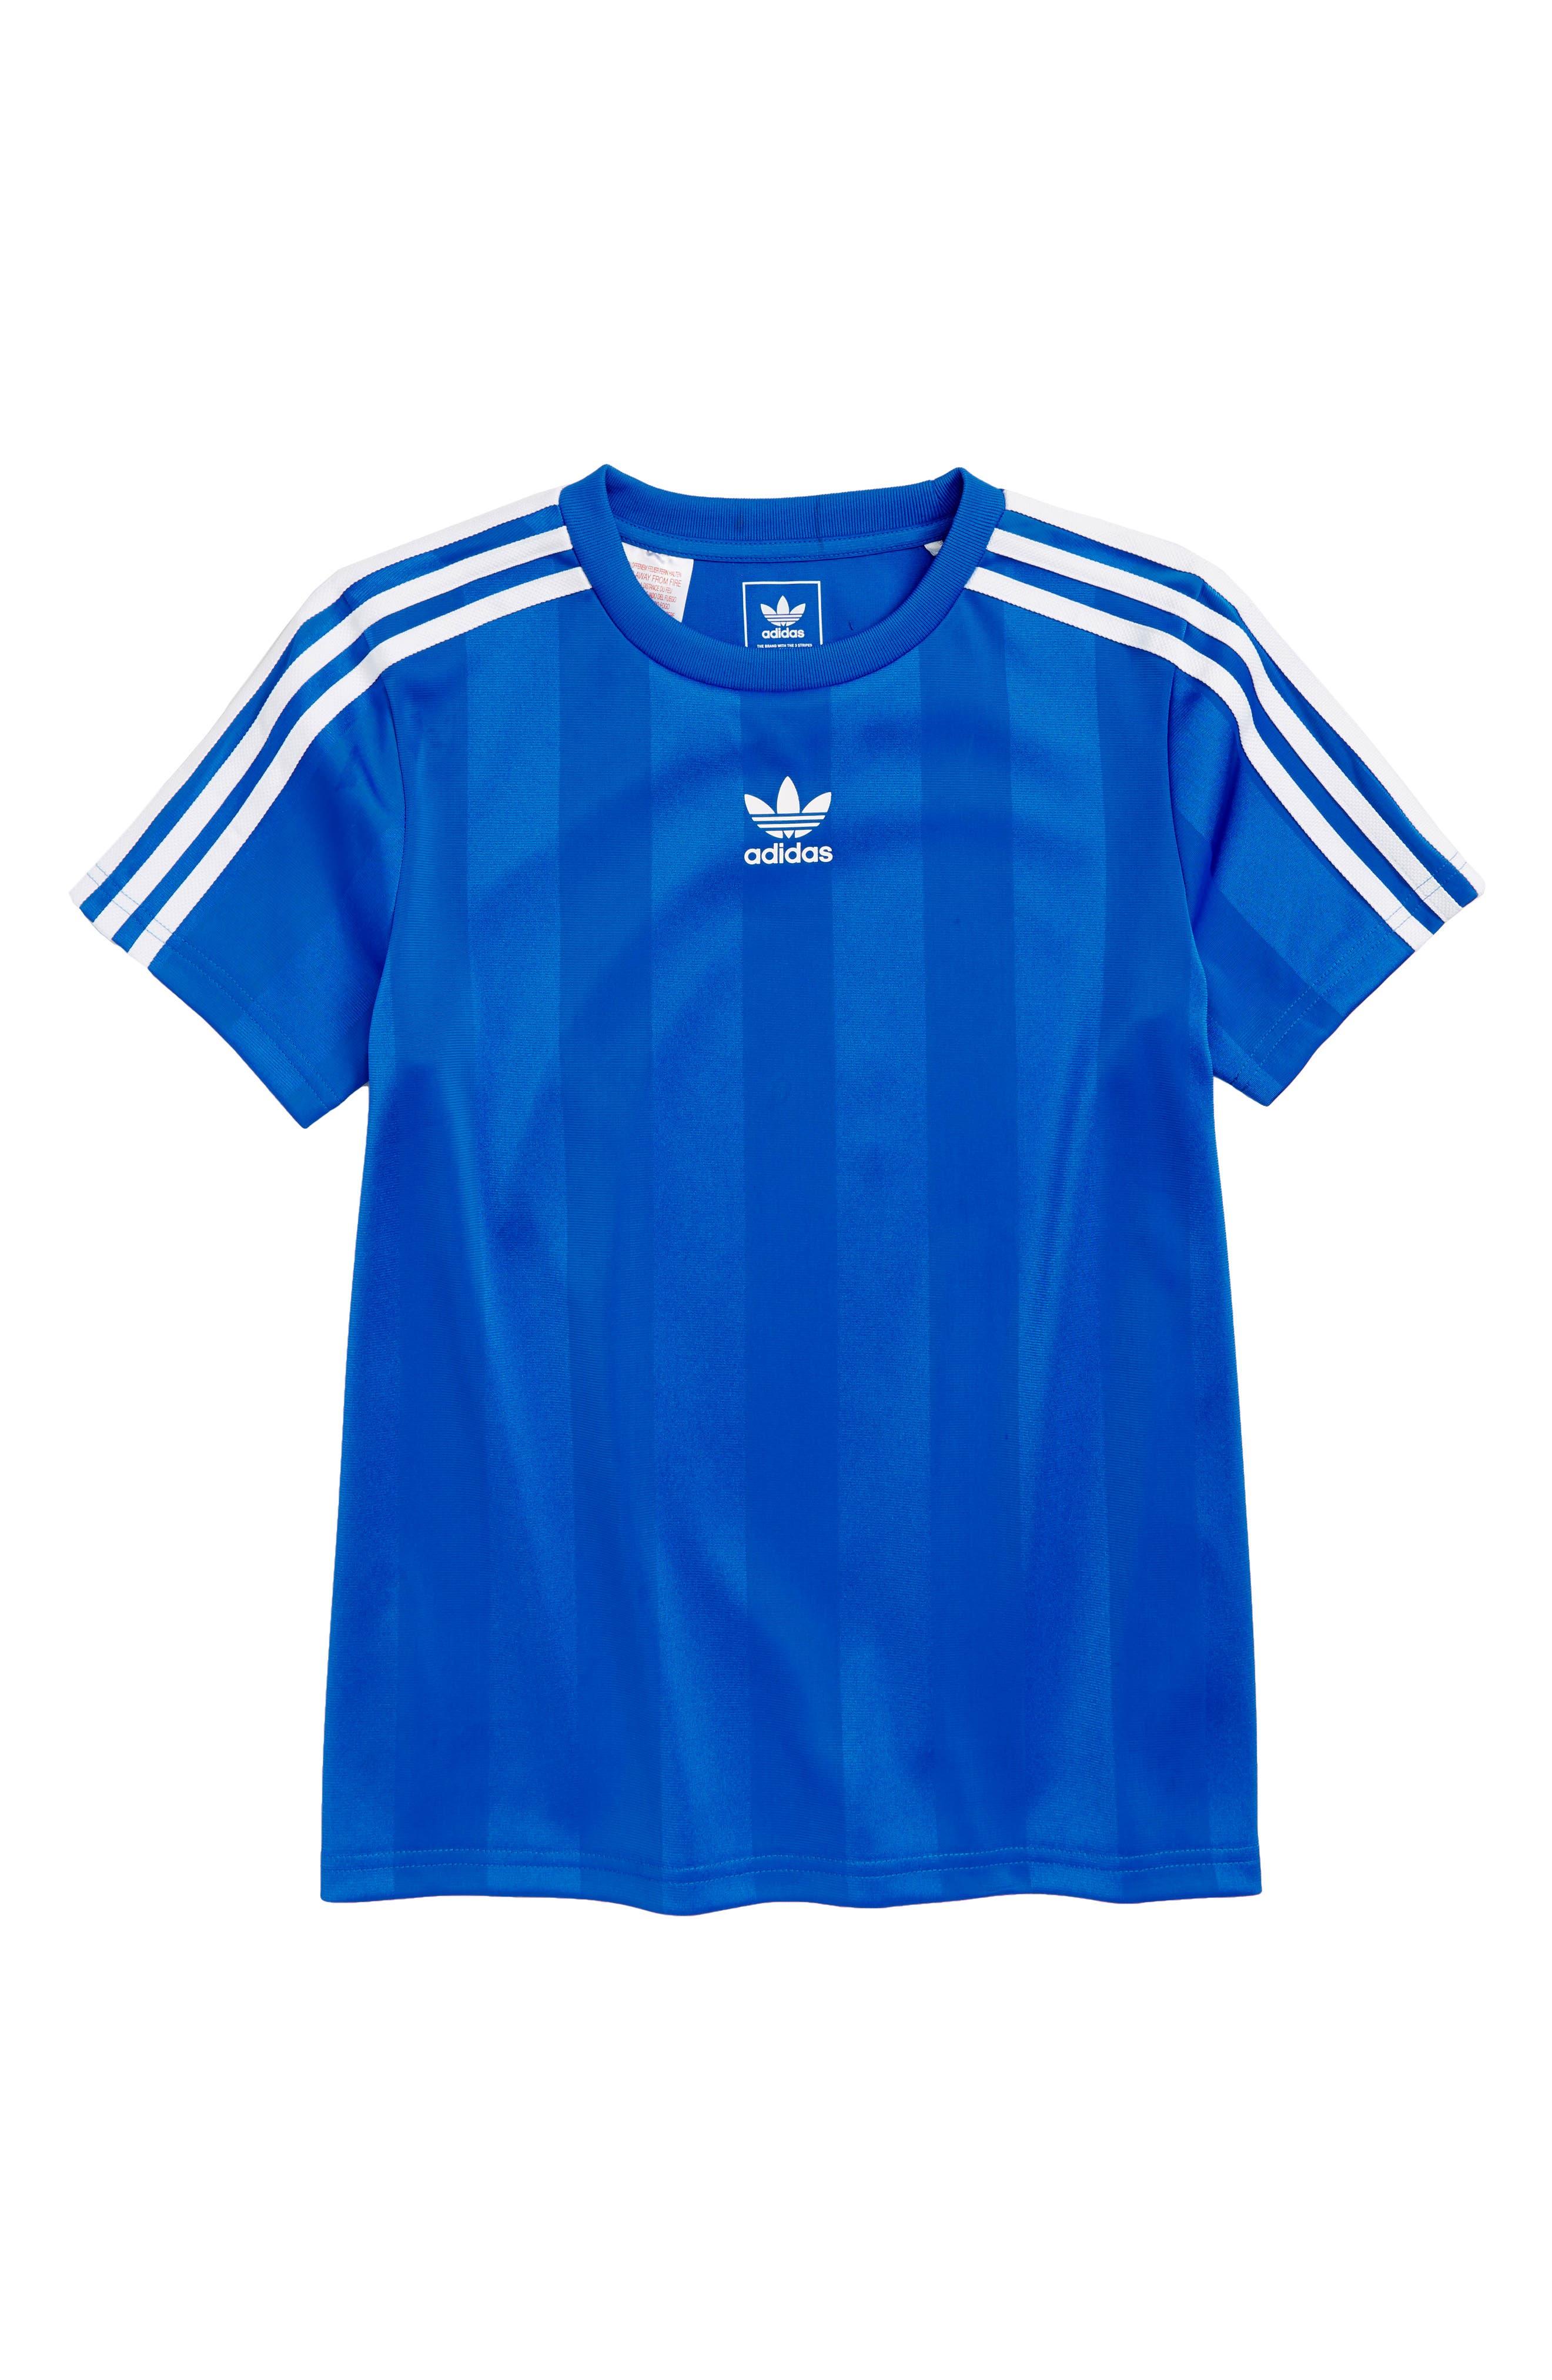 blu t shirt adidas per bambini: activewear & scarpe nordstrom